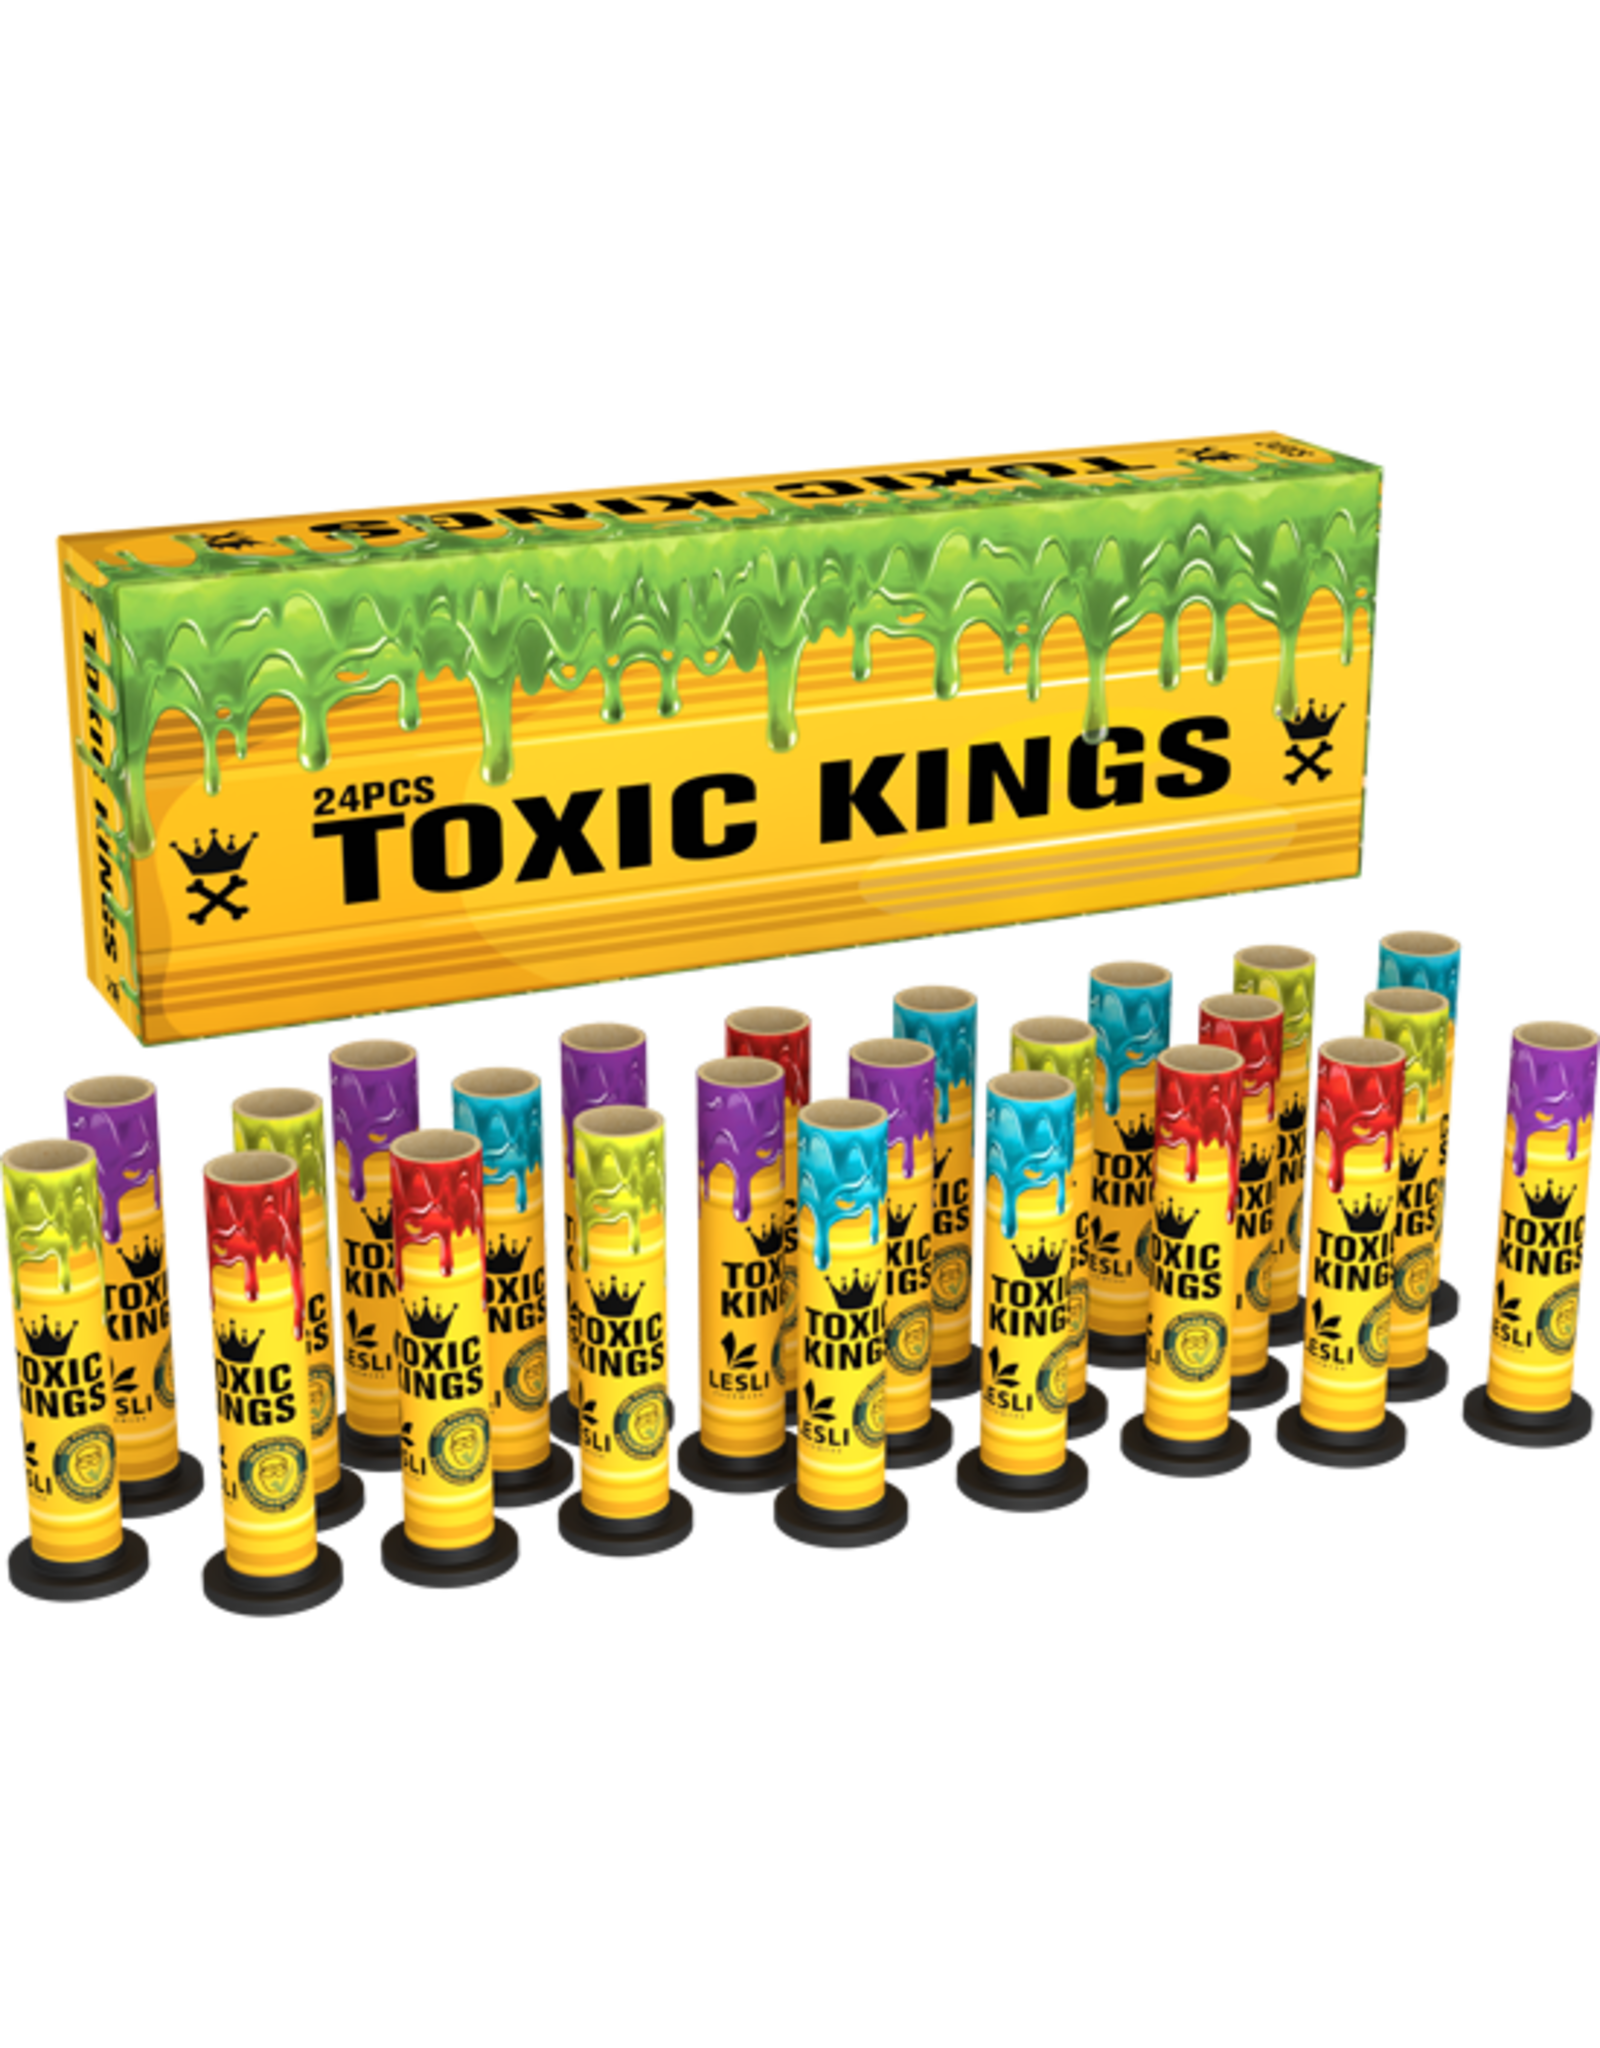 Lesli Vuurwerk Toxic Kings 24 pcs